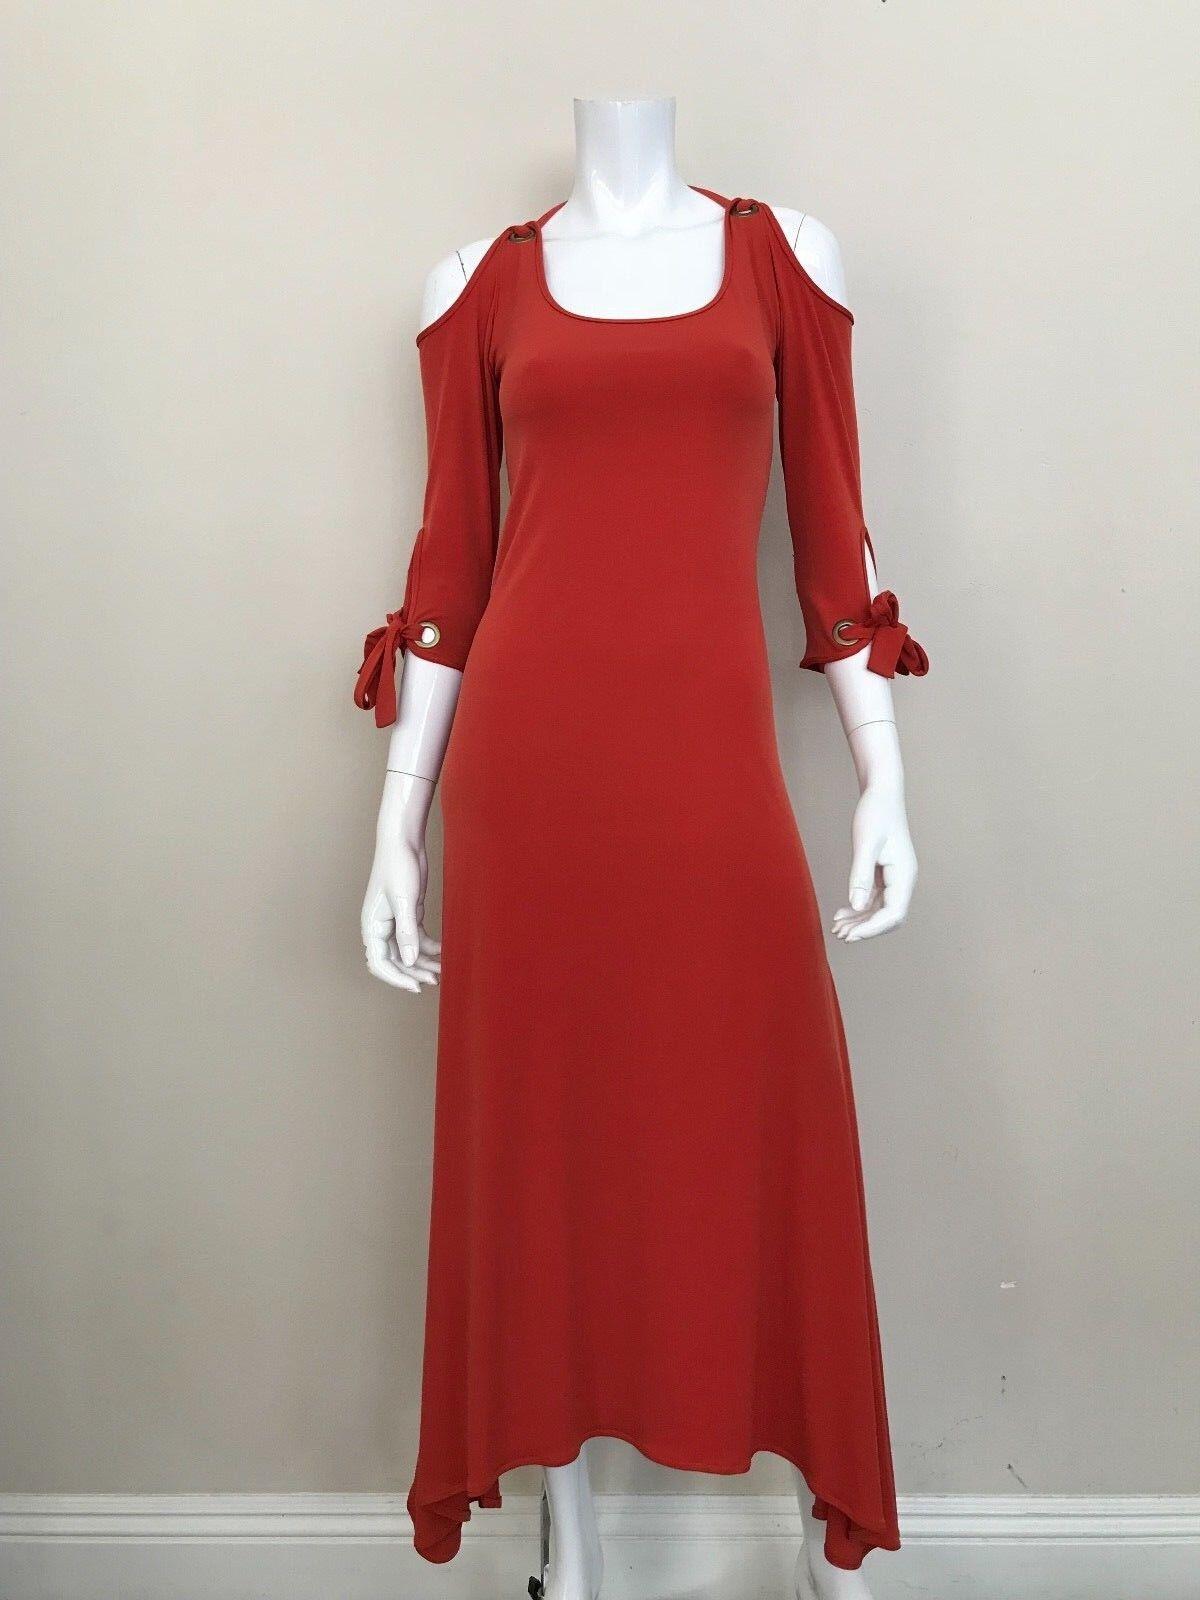 EVA VARRO NWT Burnt Orange Long Dress 3 4 Sleeves w Grommets Größe Small NEW